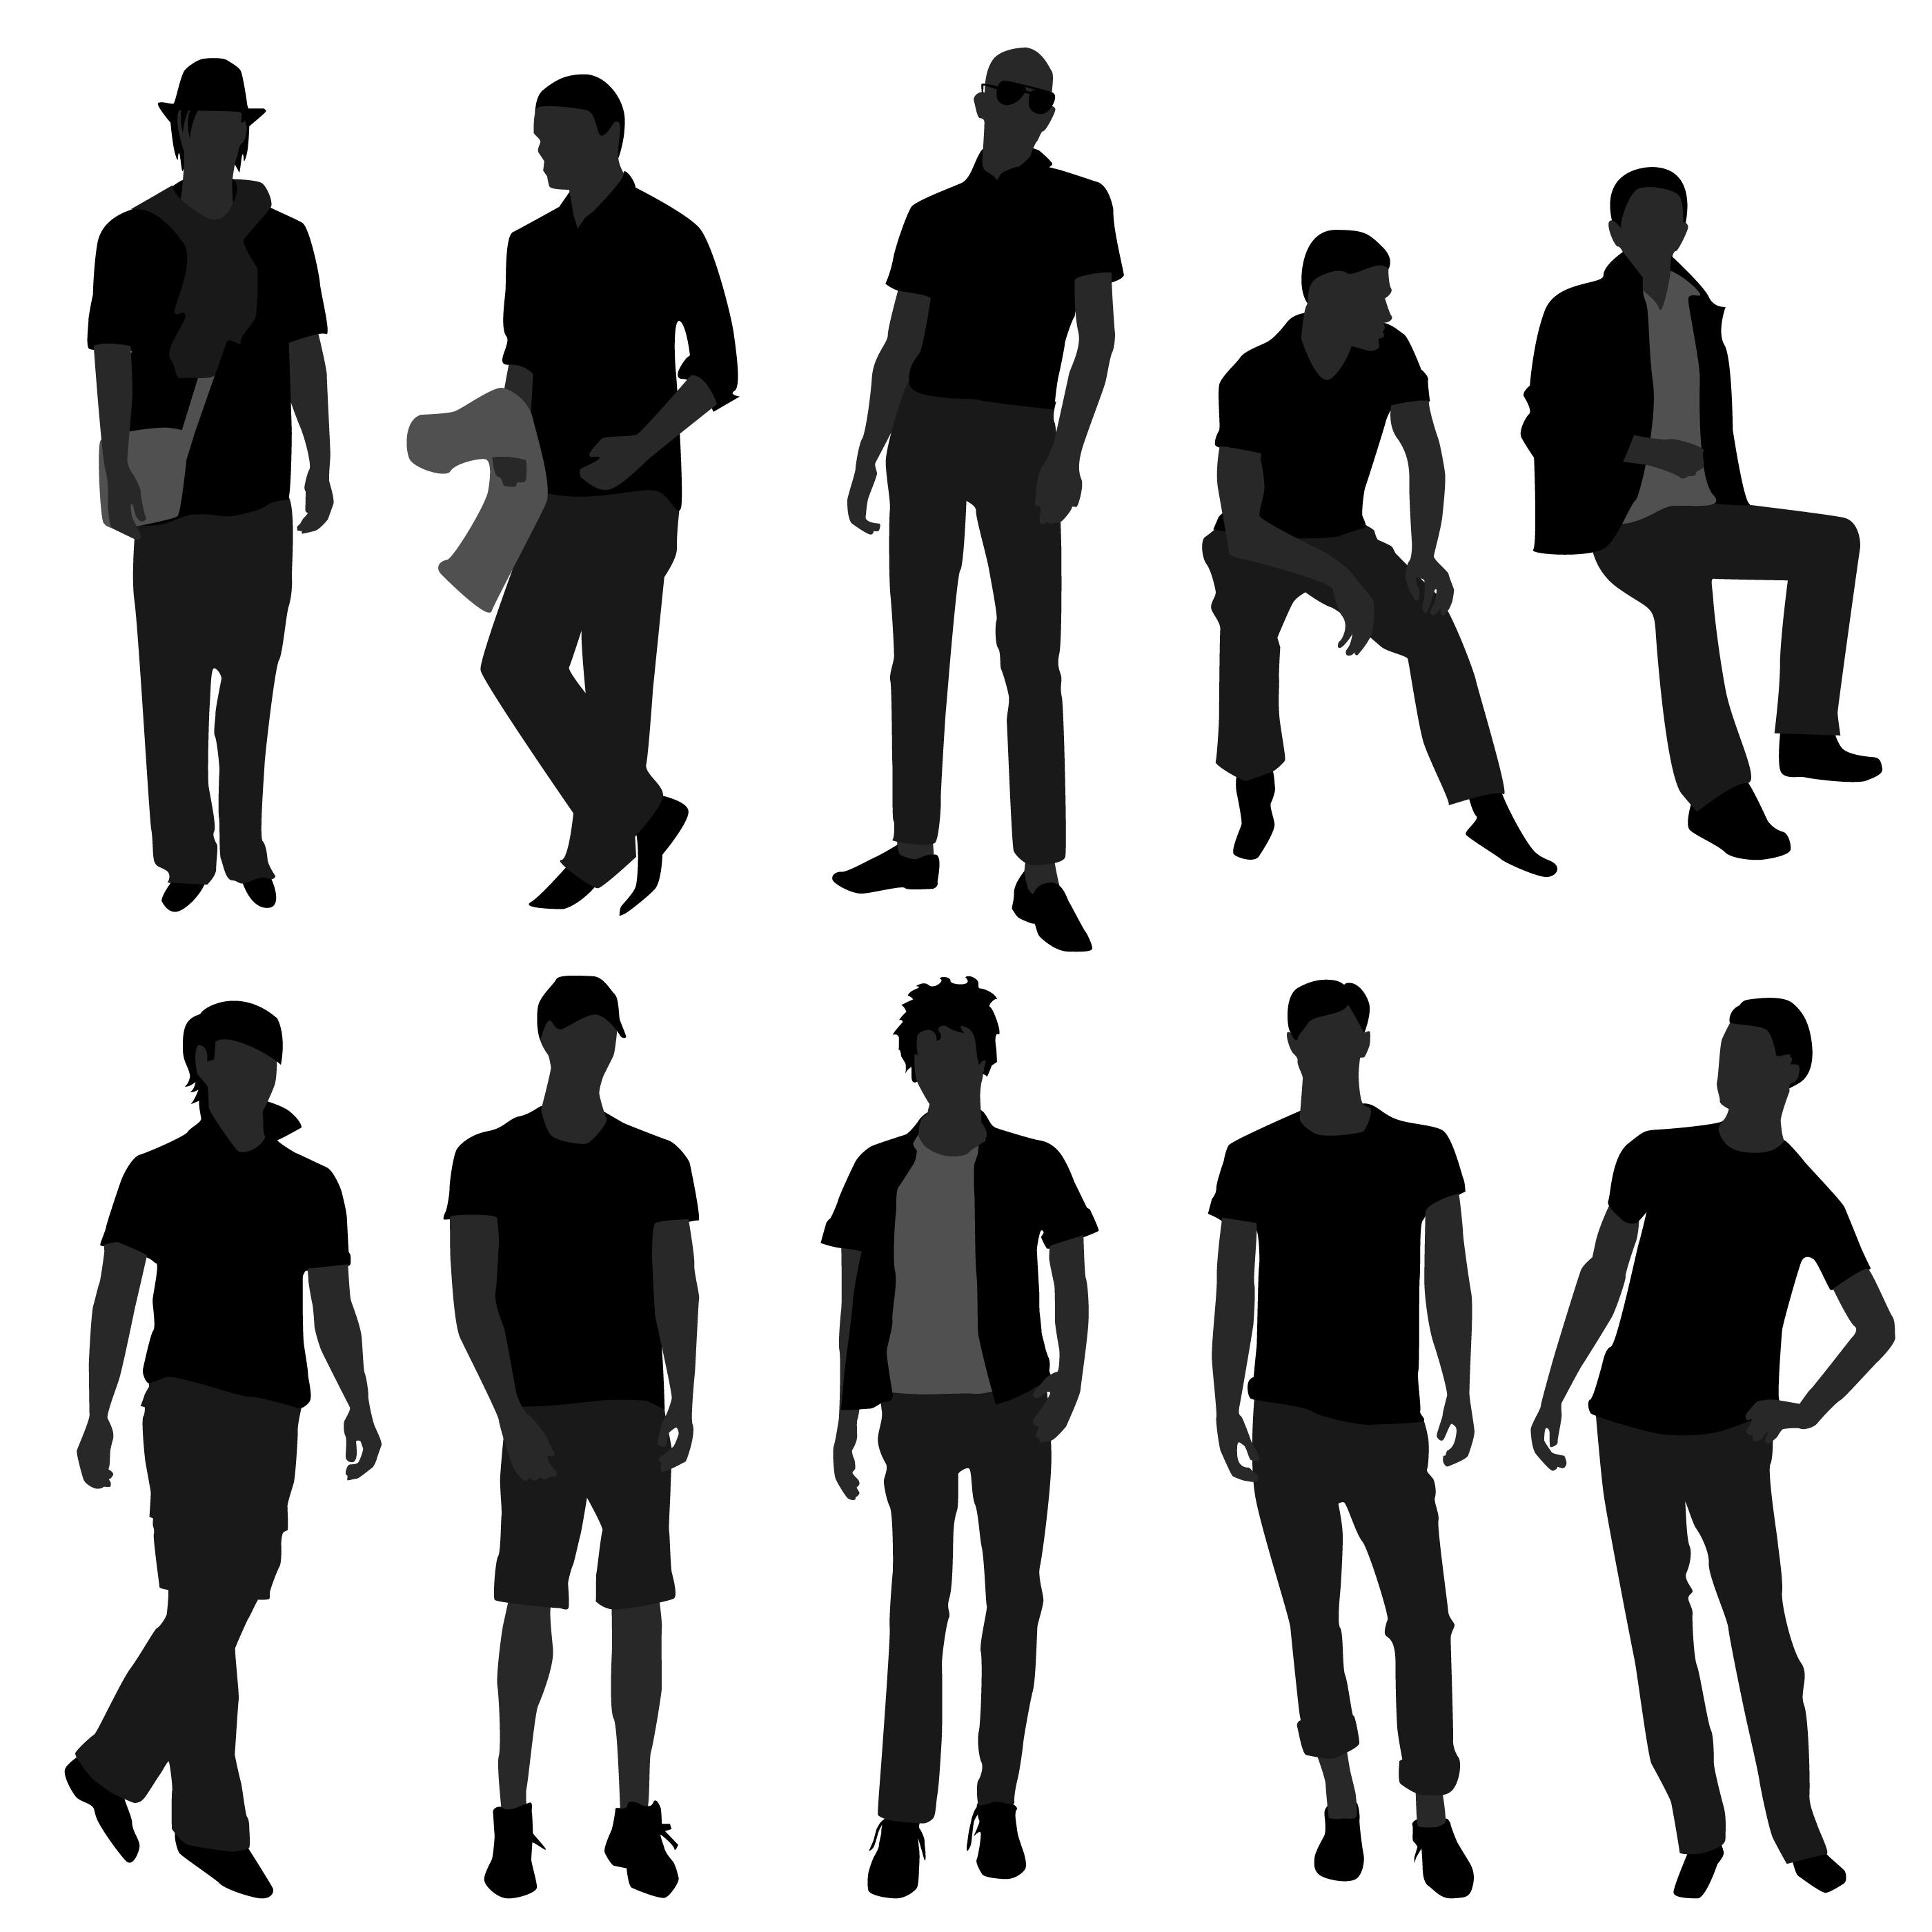 Male Fashion Shopping Models